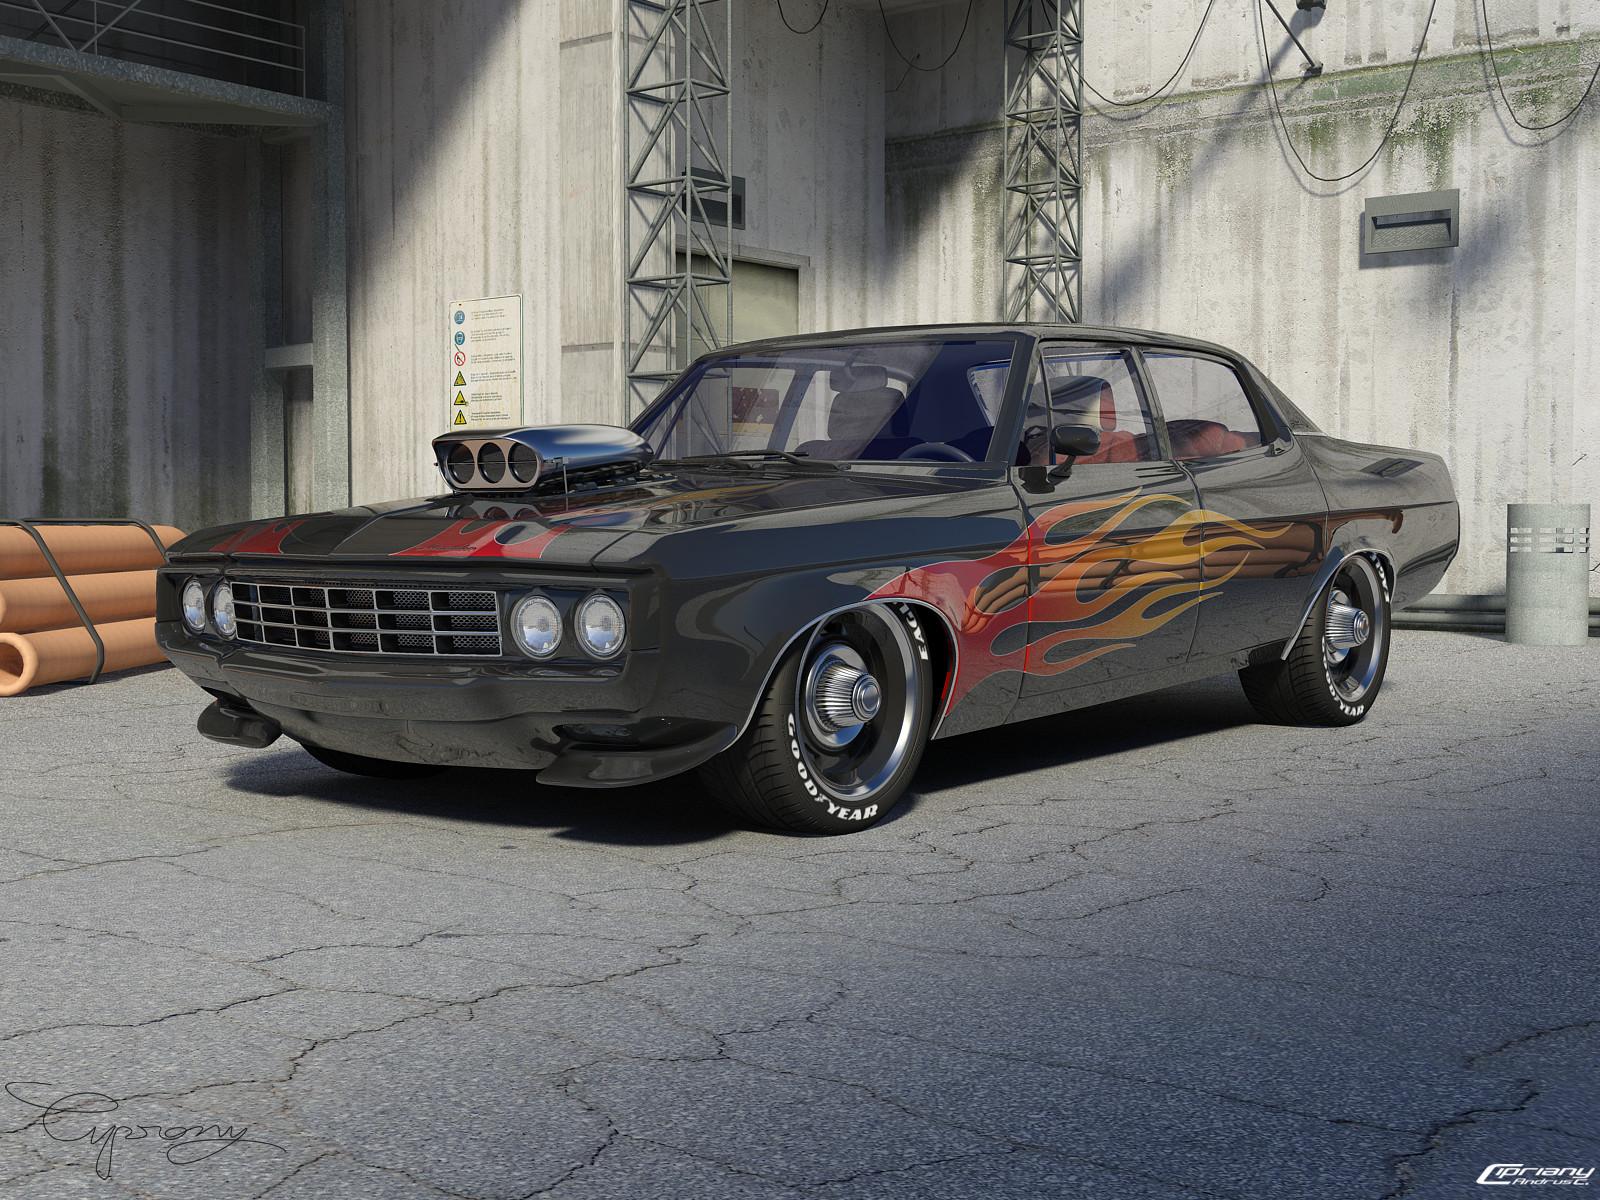 Matador Car: AMC Matador: Photos, Reviews, News, Specs, Buy Car